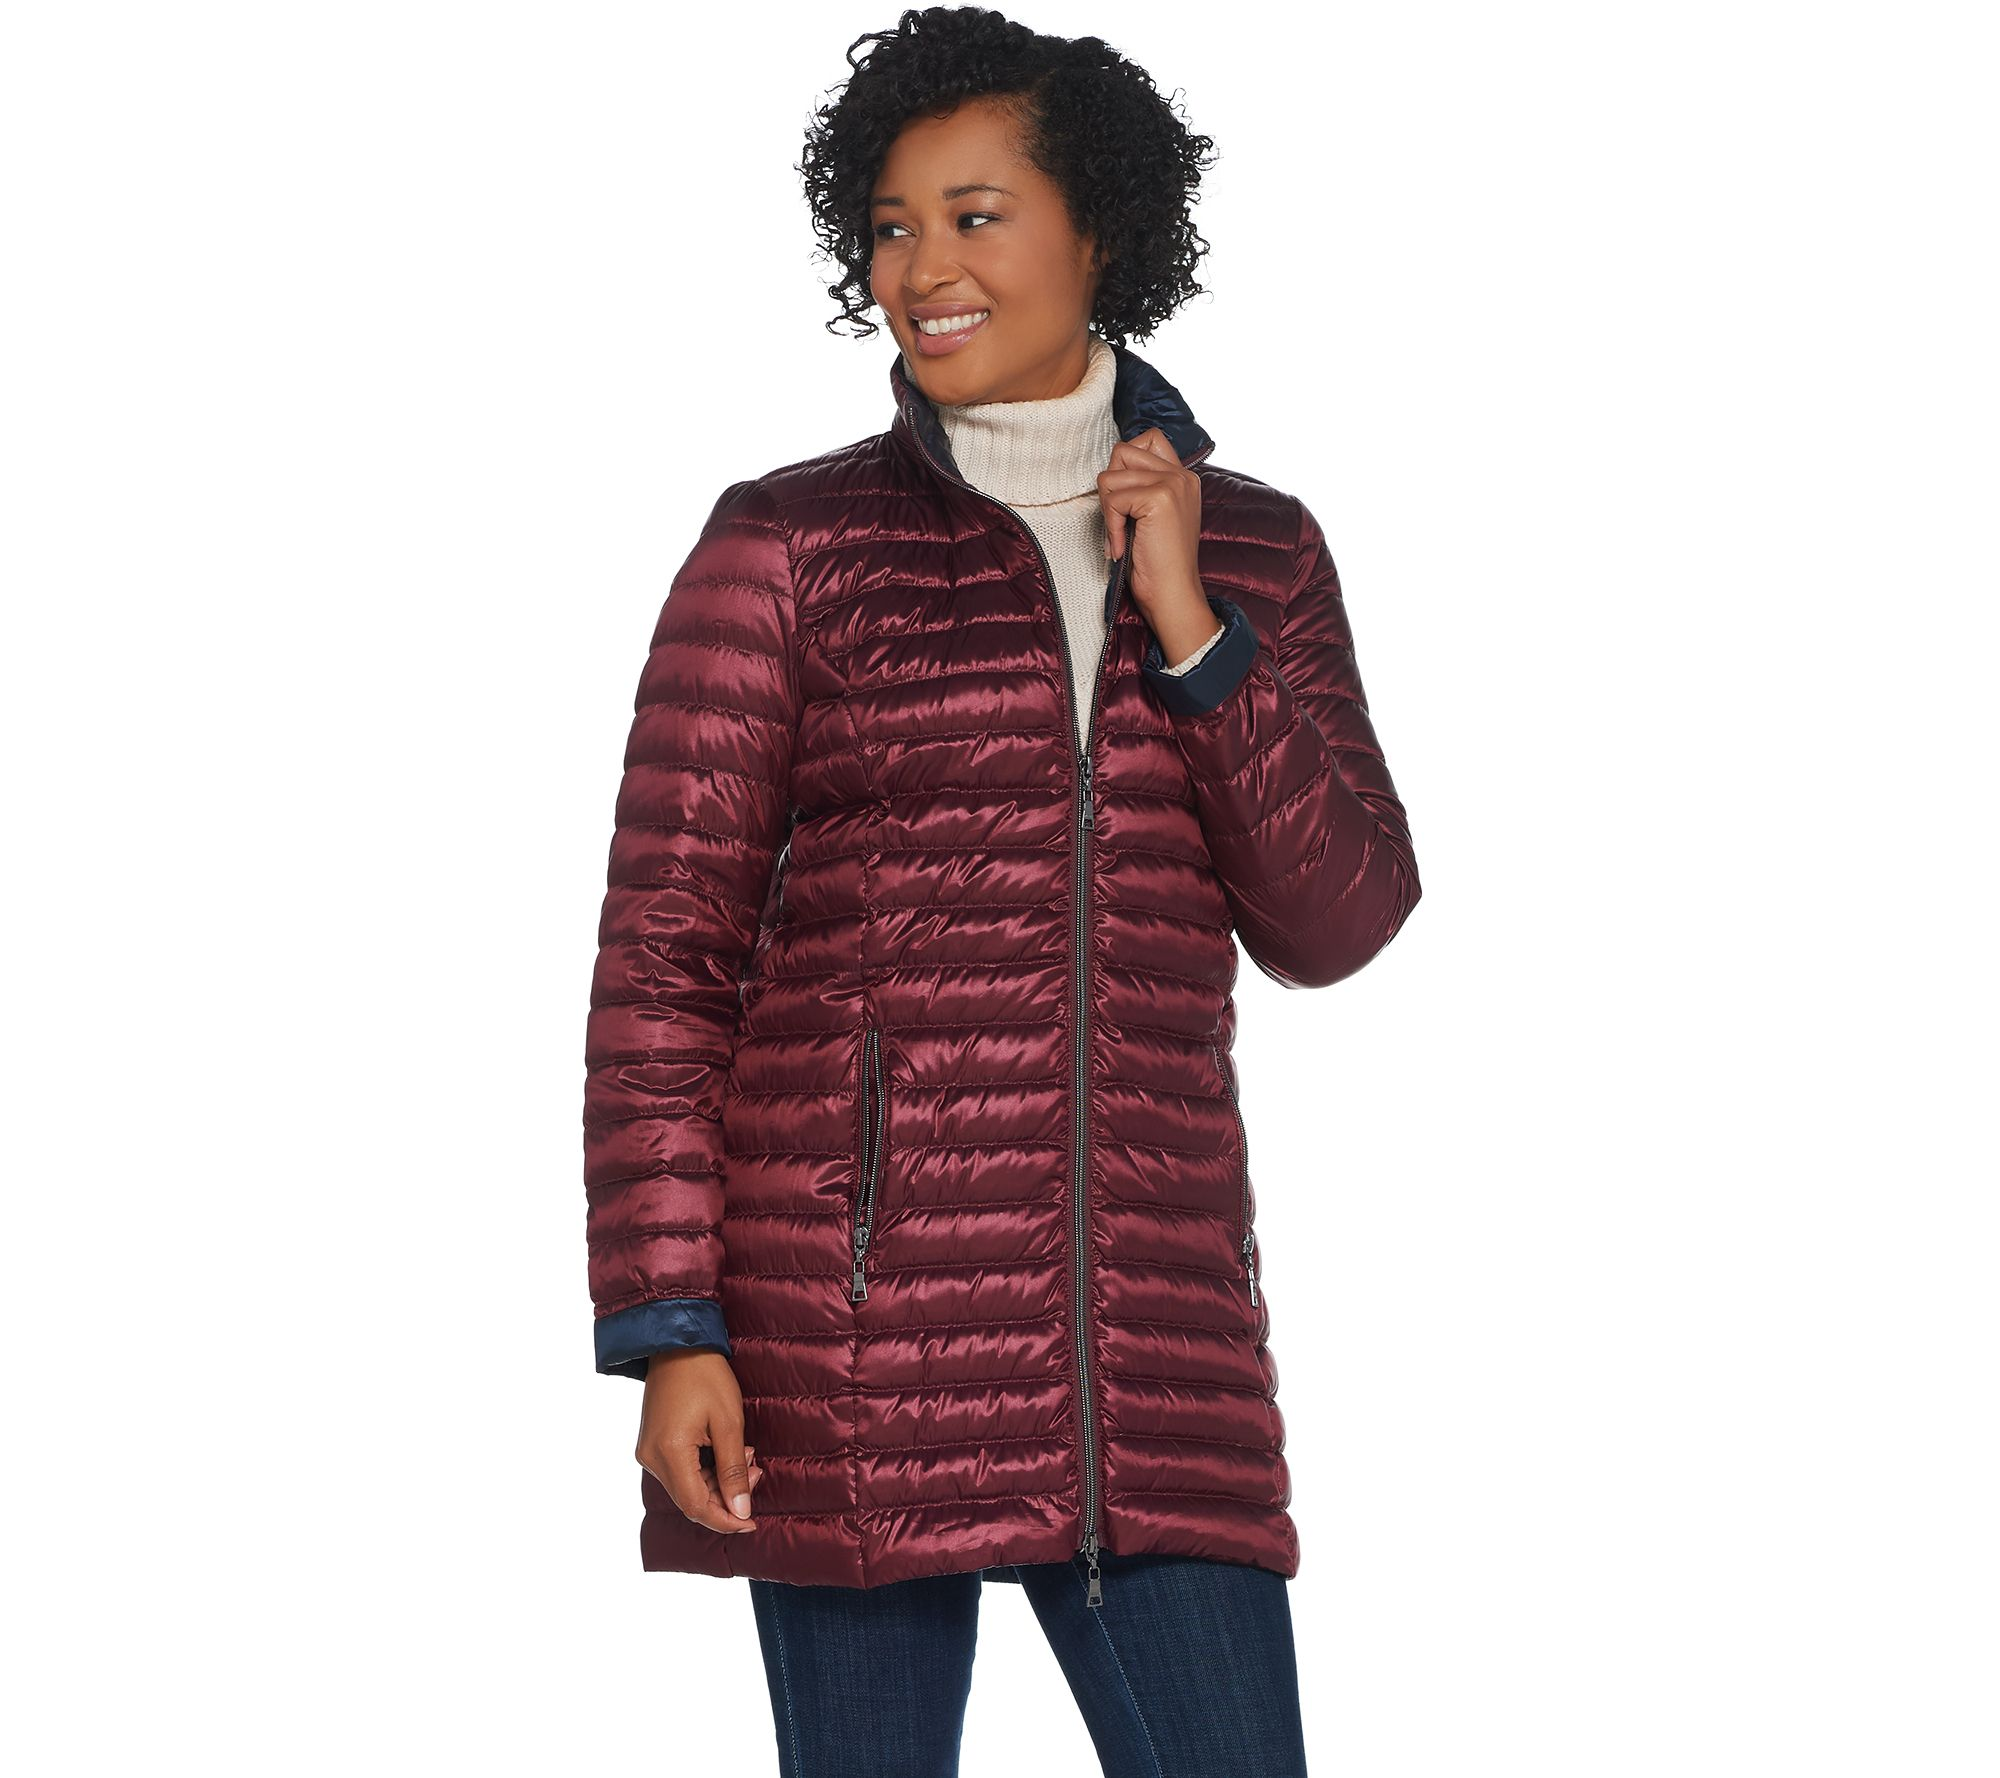 fe4e2f8a026 Nuage Packable Jacket with Removable Hood - Page 1 — QVC.com